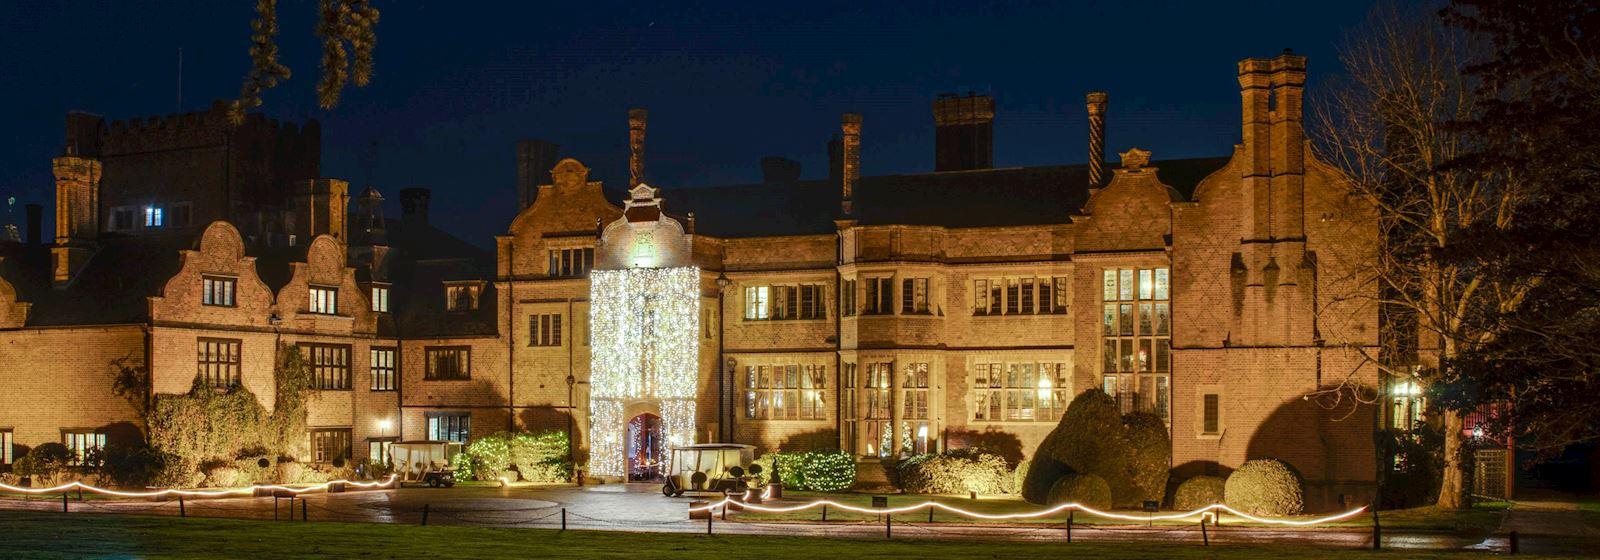 Hanbury Manor Marriott Hotel & Country Club Christmas